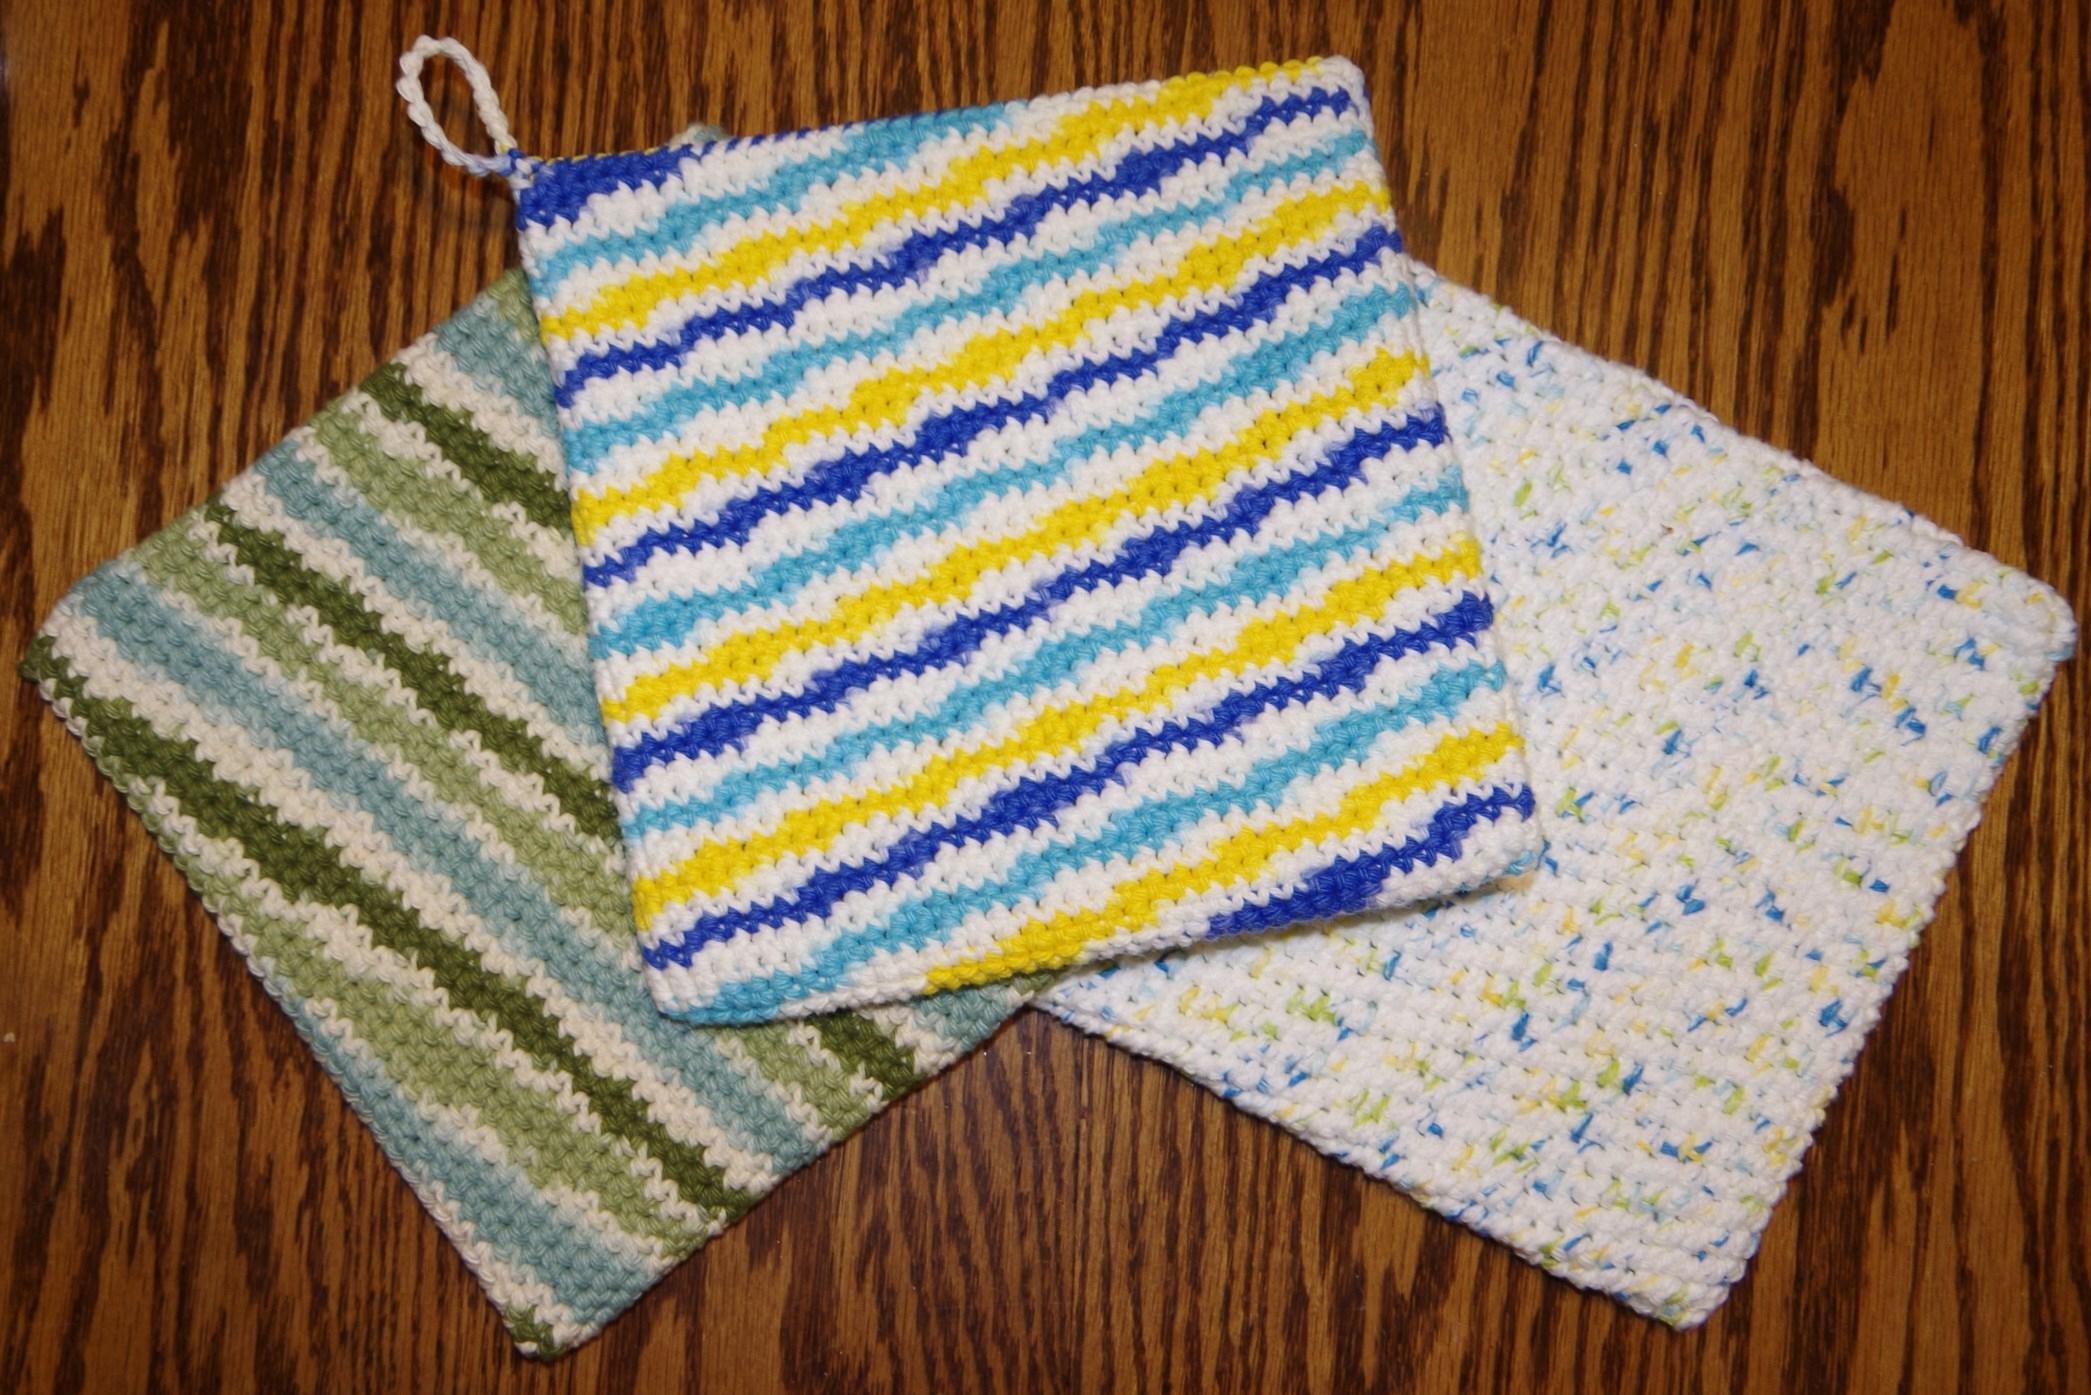 Crochet Trivets Hot Pads Pot Holders Double Thick Potholder Free Crochet Pattern Yay For Yarn